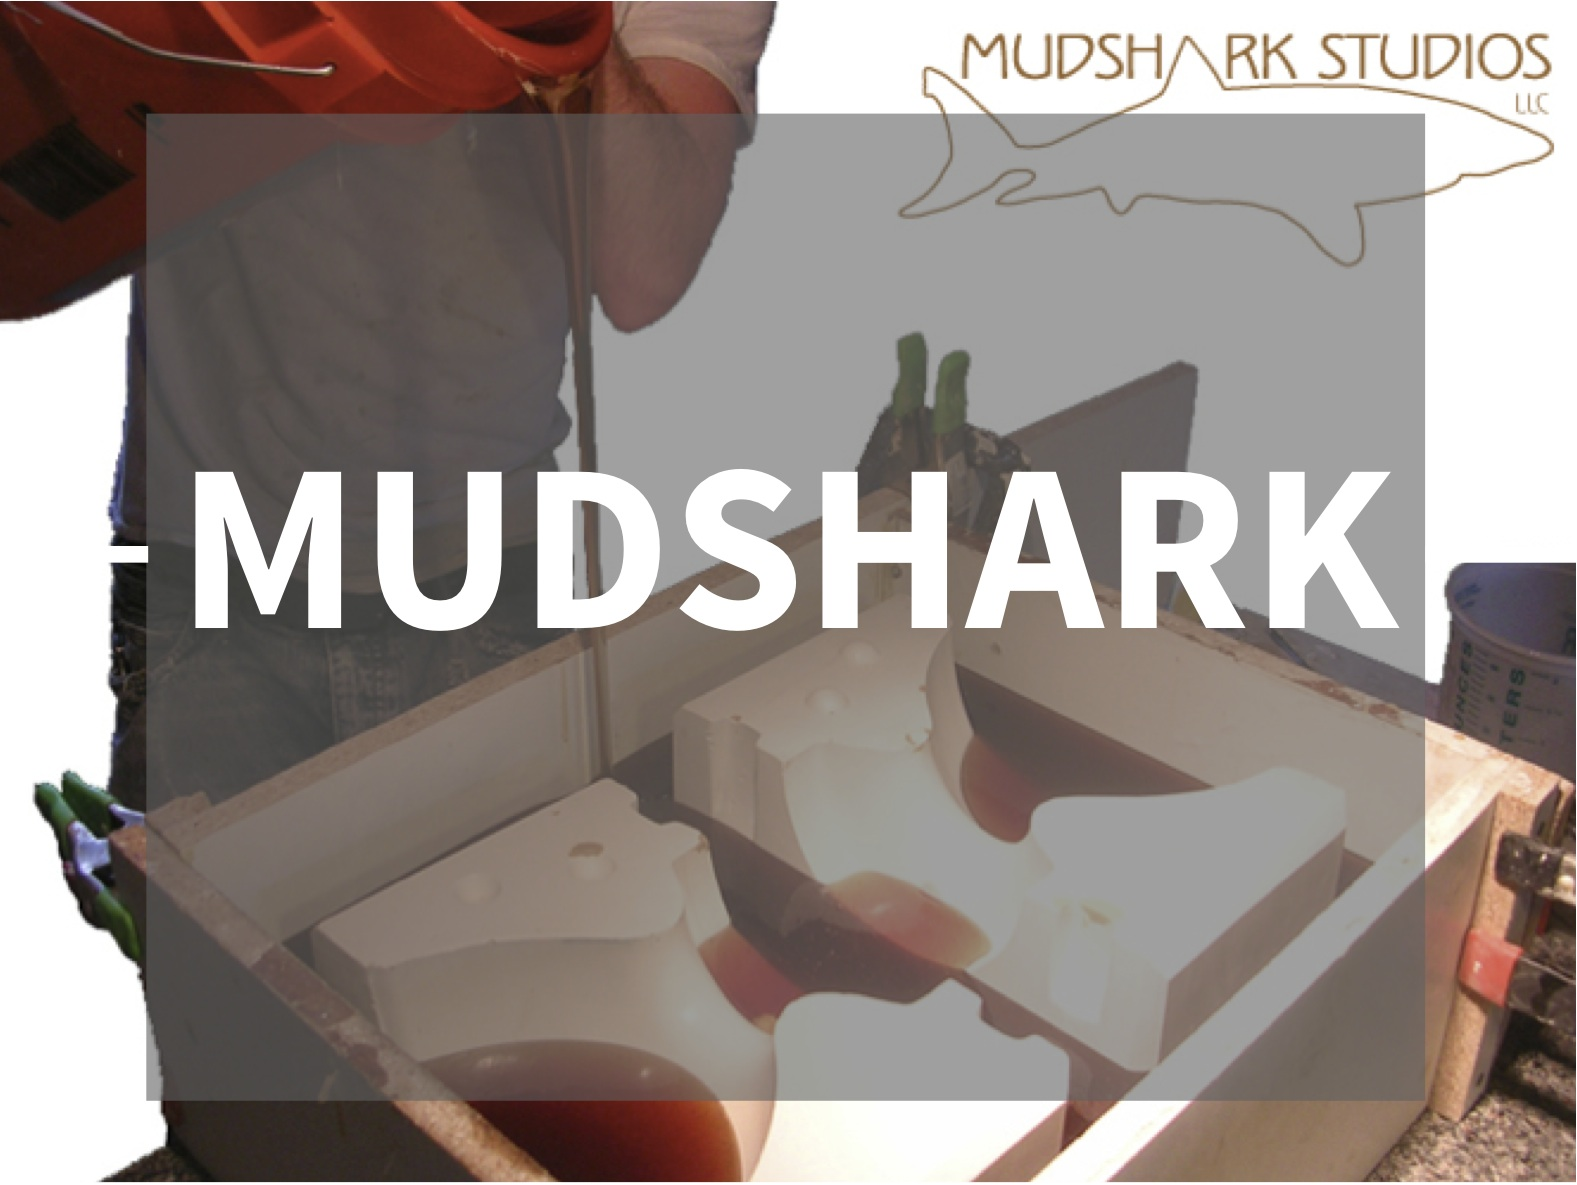 MUDSHARK.jpg